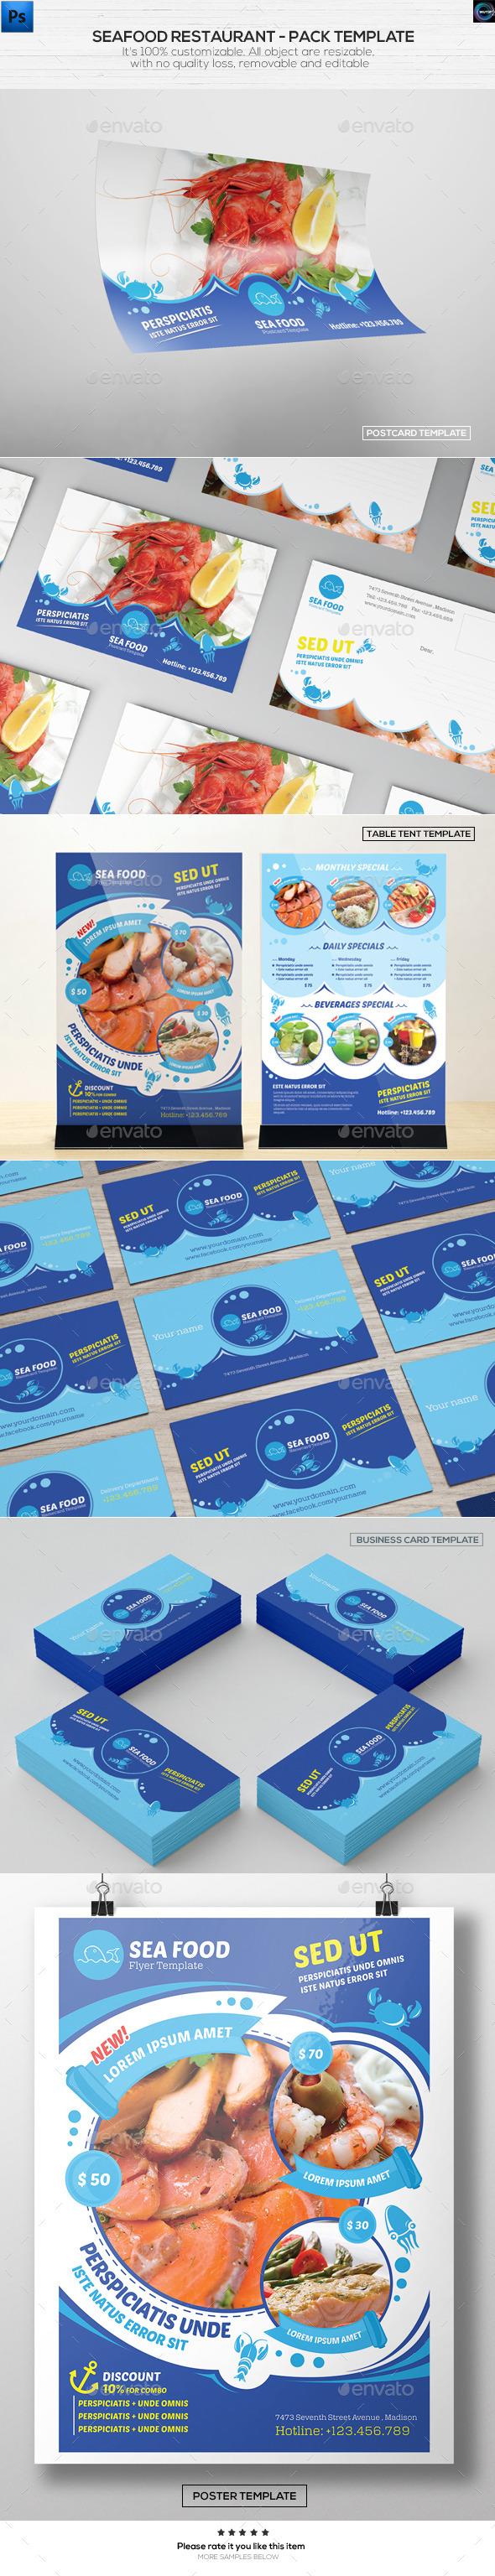 Seafood Restaurant - Pack Template - Food Menus Print Templates